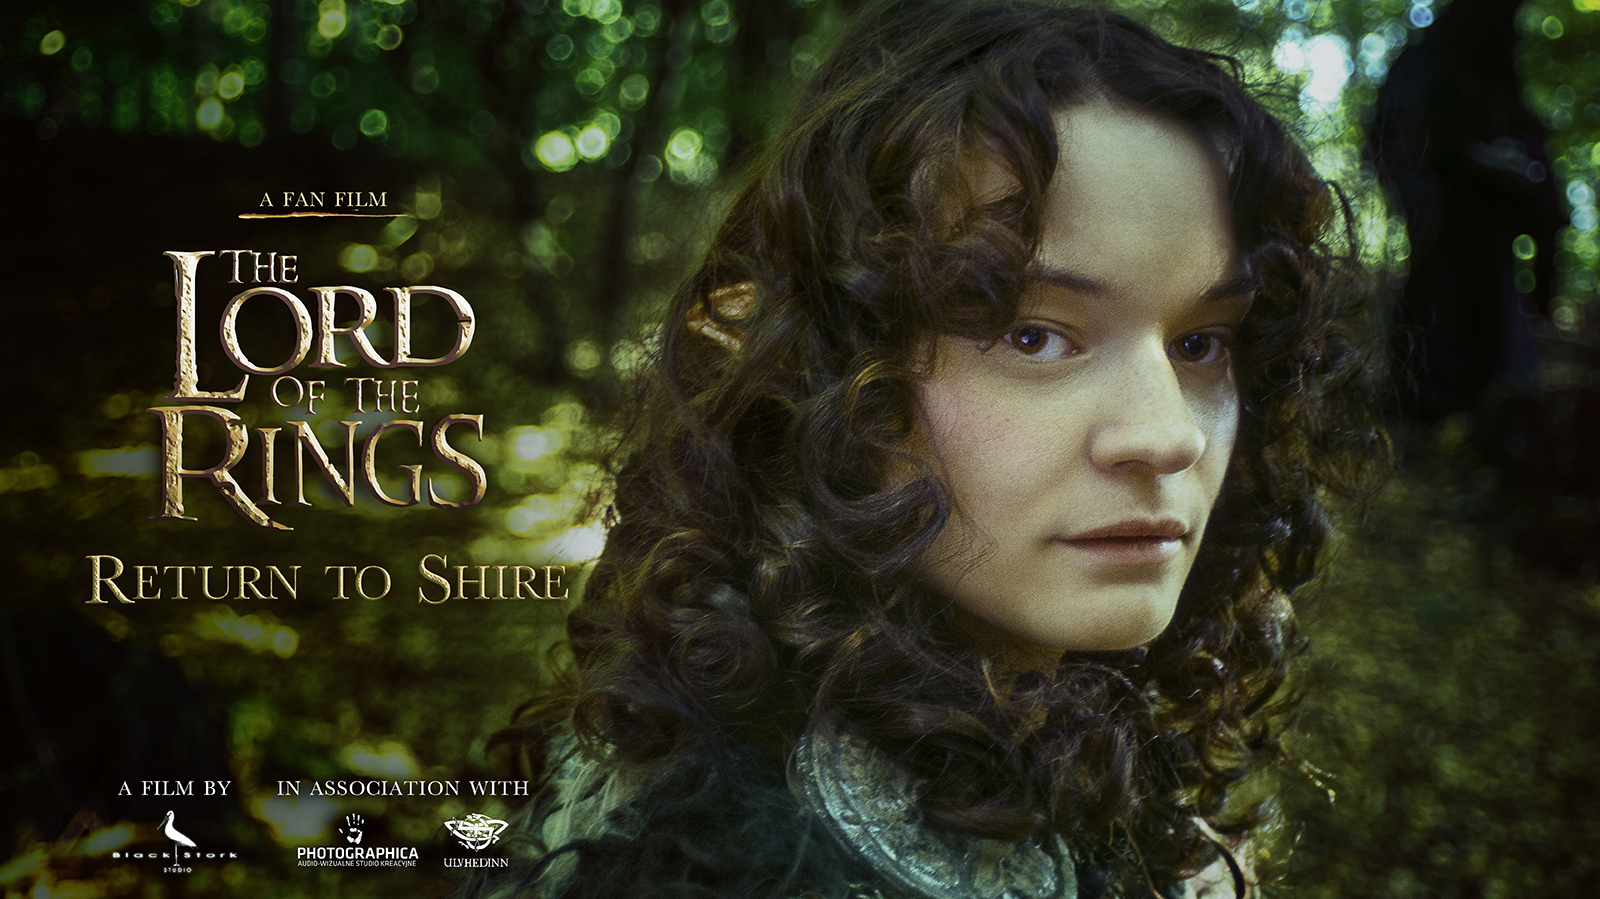 LotR RtS poster - Wojownicza hobbitka